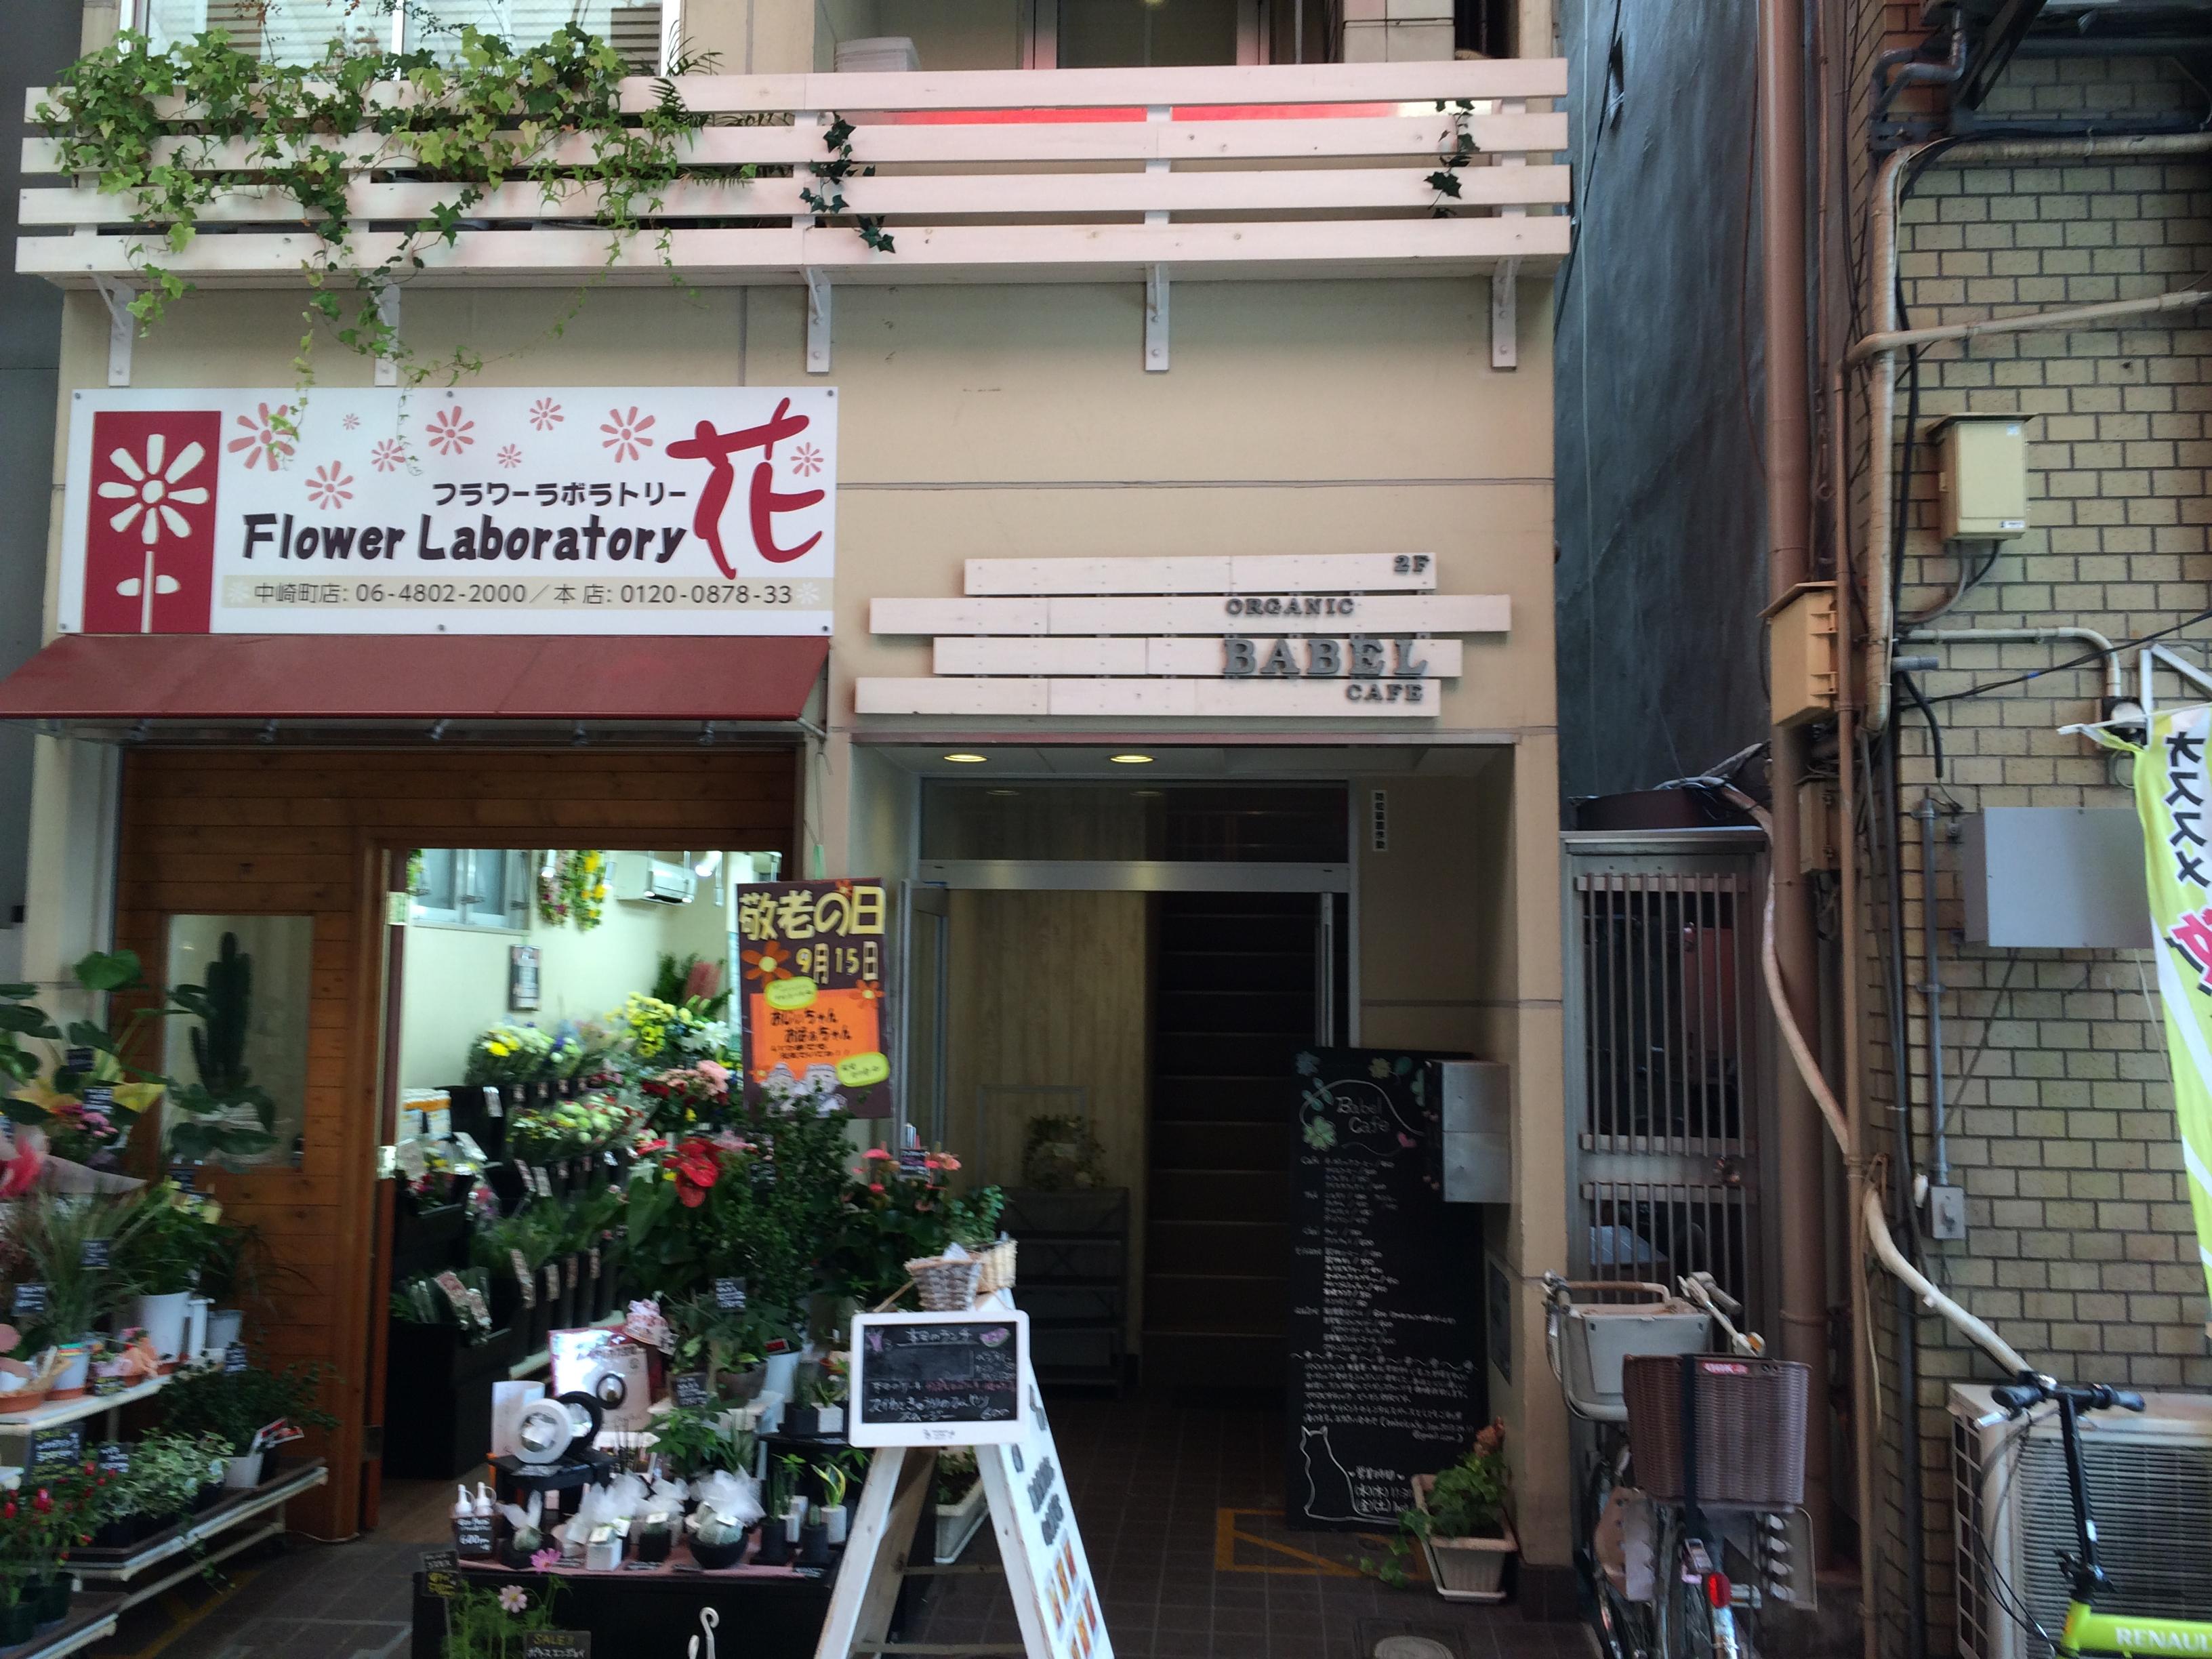 BABEL CAFE外観